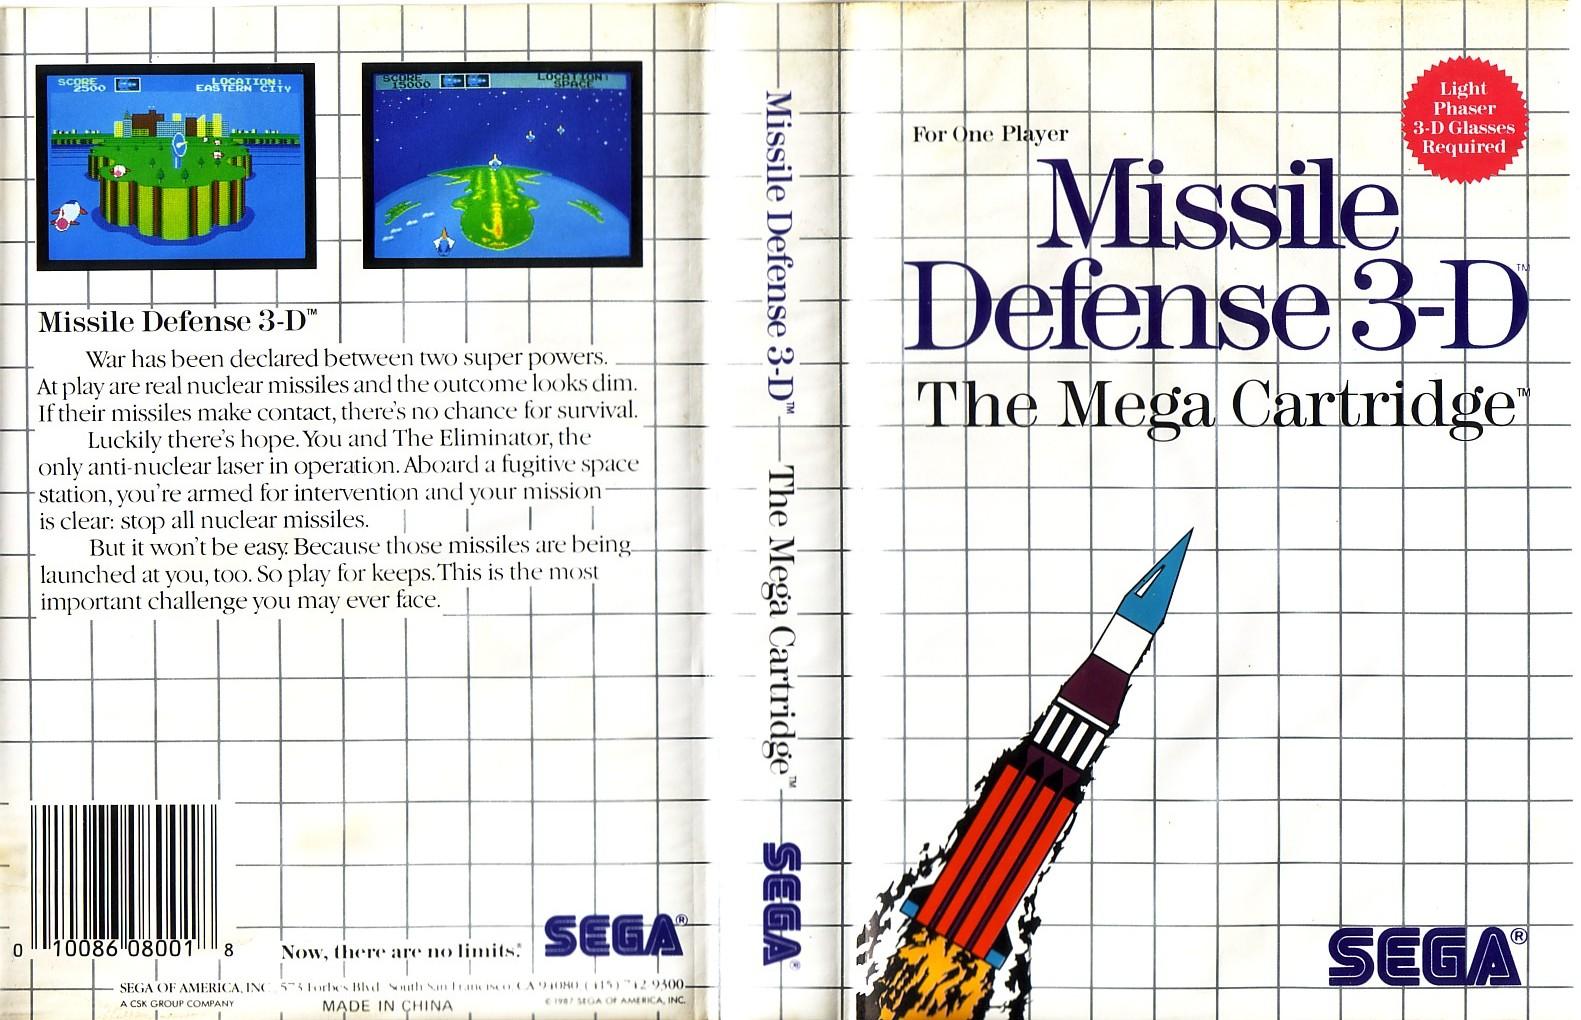 http://www.smspower.org/uploads/Scans/MissileDefense3D-SMS-US-MadeInChina.jpg